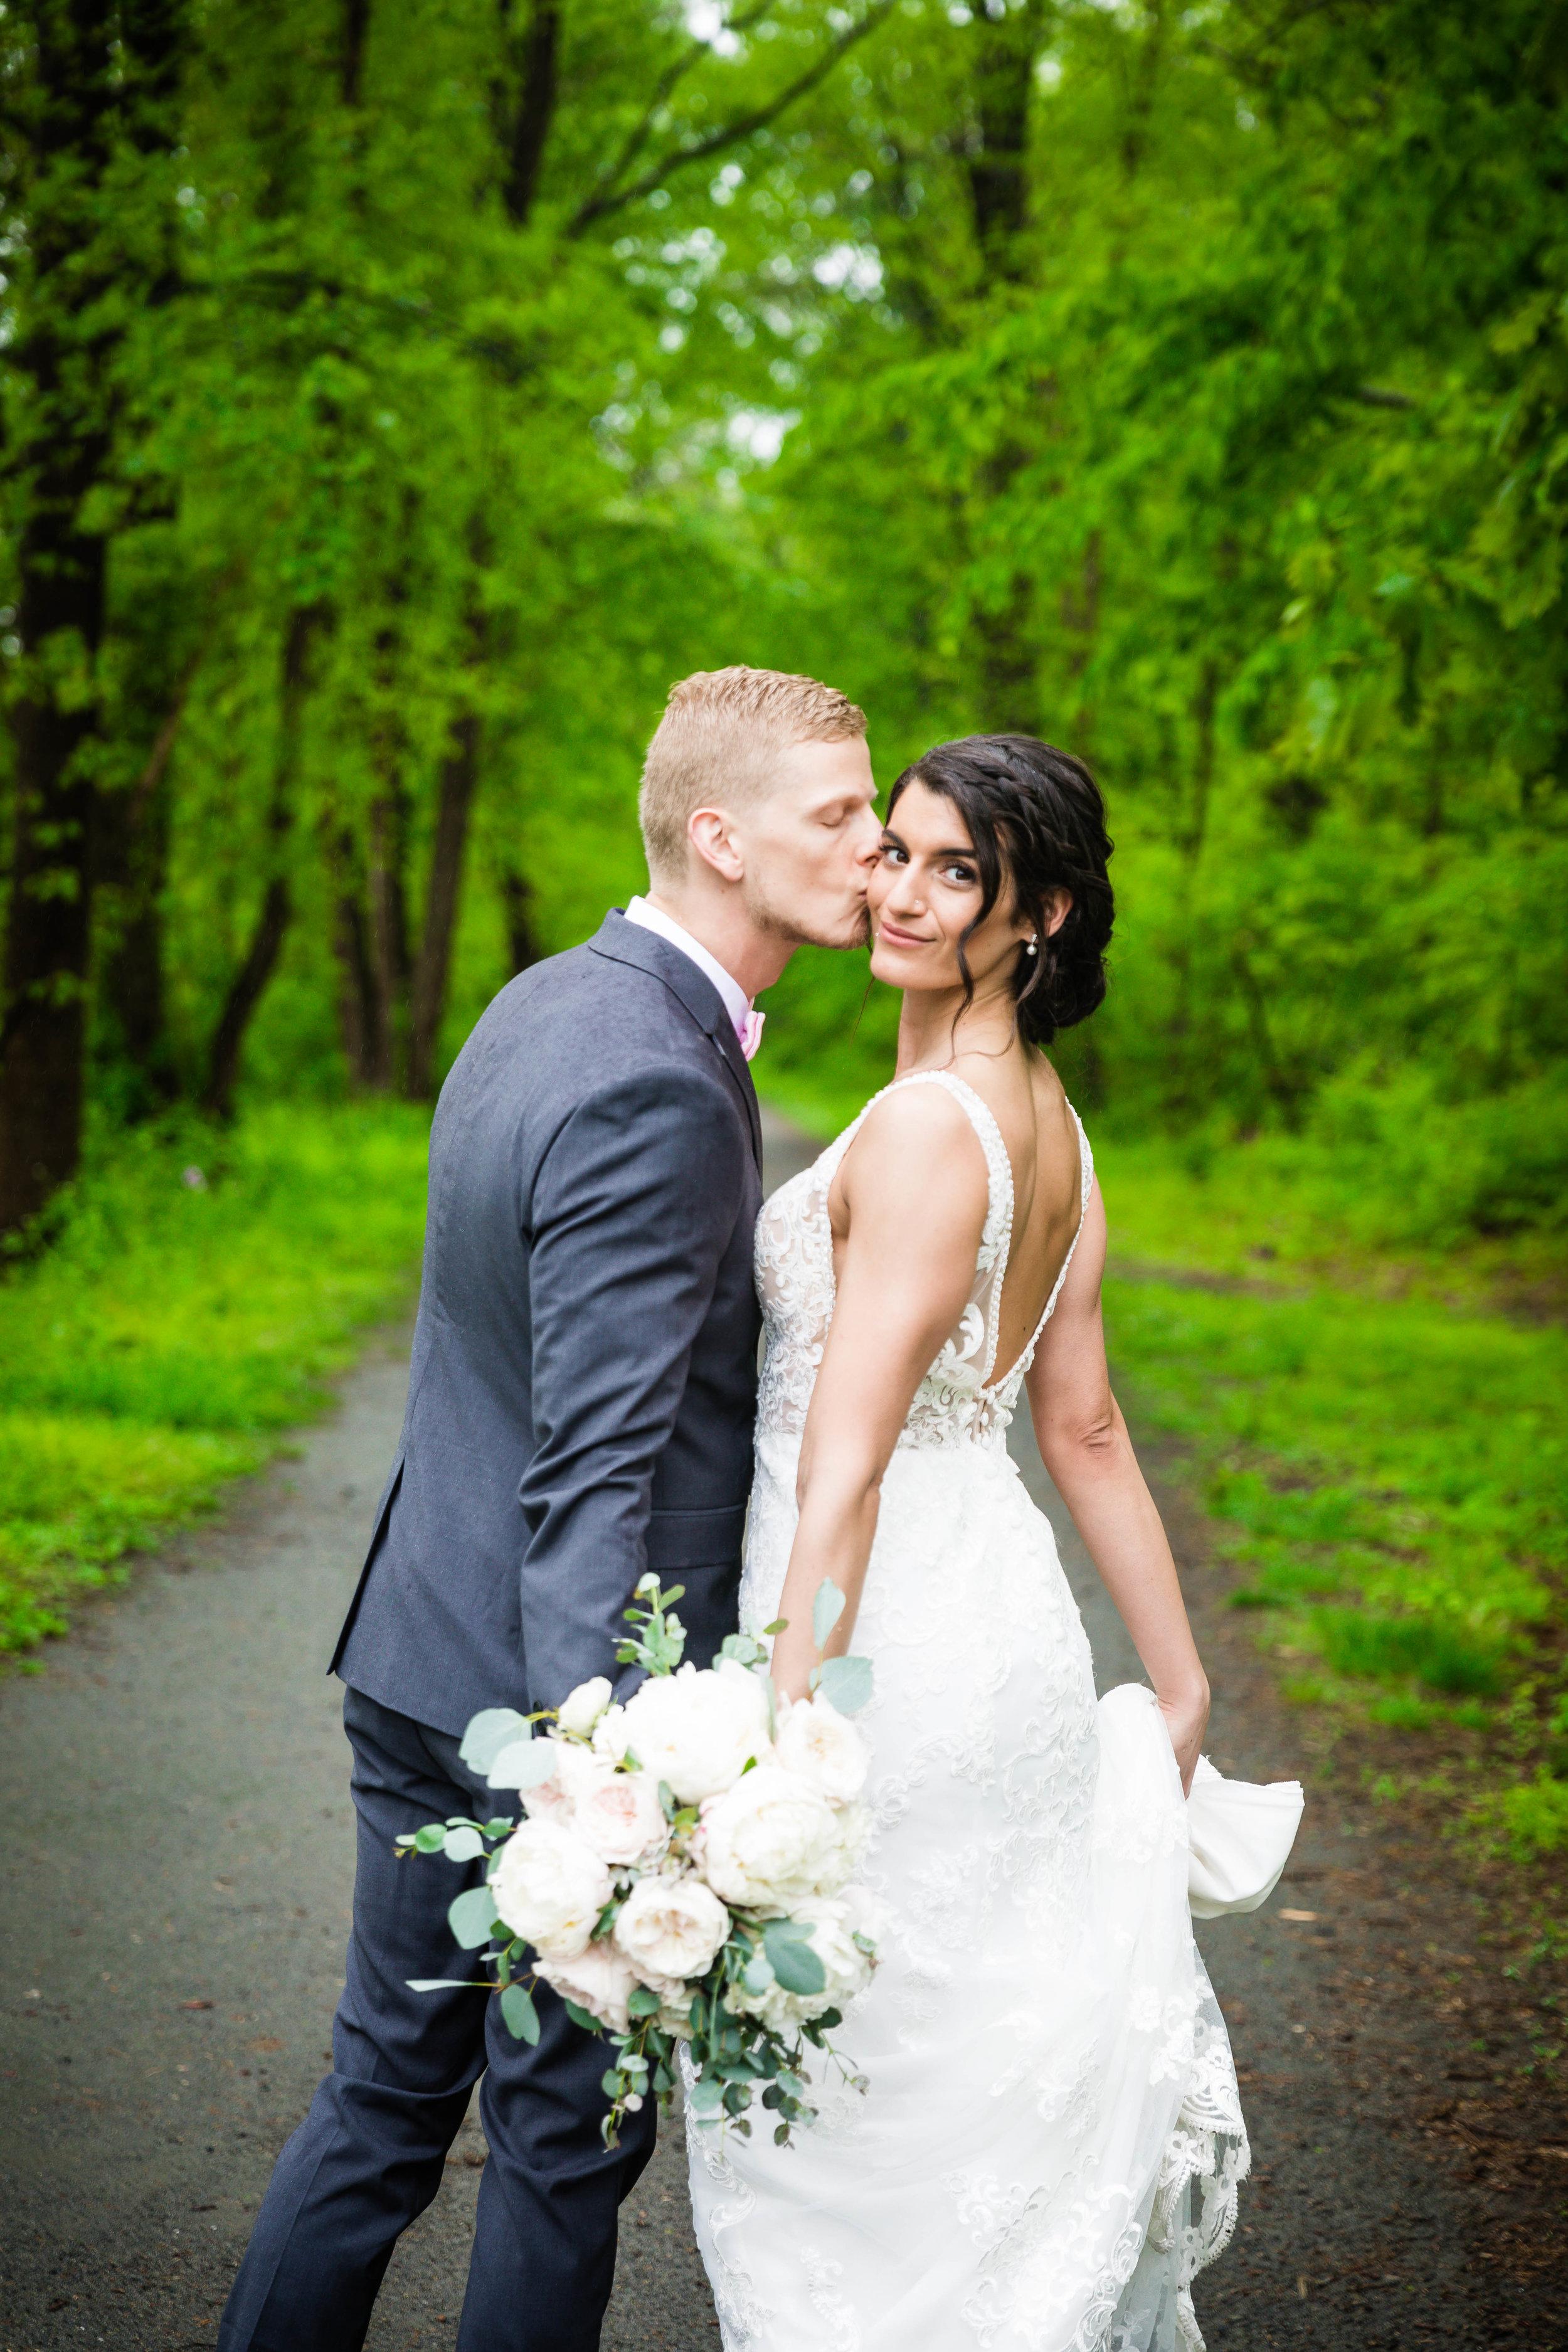 PRALLISVILLE MILLS NEW HOPE WEDDING PHOTOGRAPHY-94.jpg